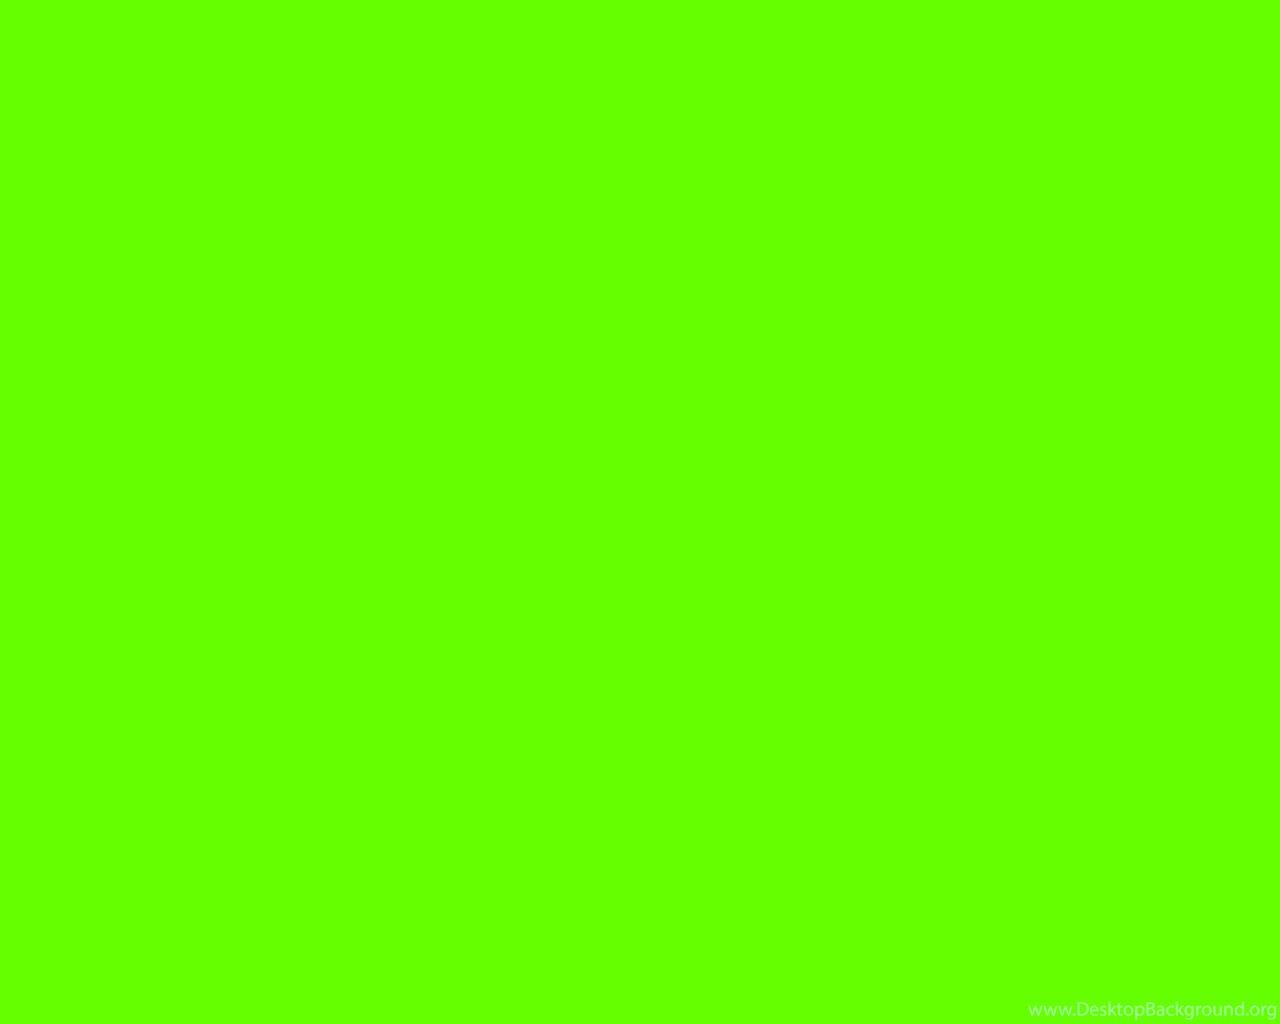 Neon Green Wallpaper Background - WallpaperSafari |Bright Green Color Background